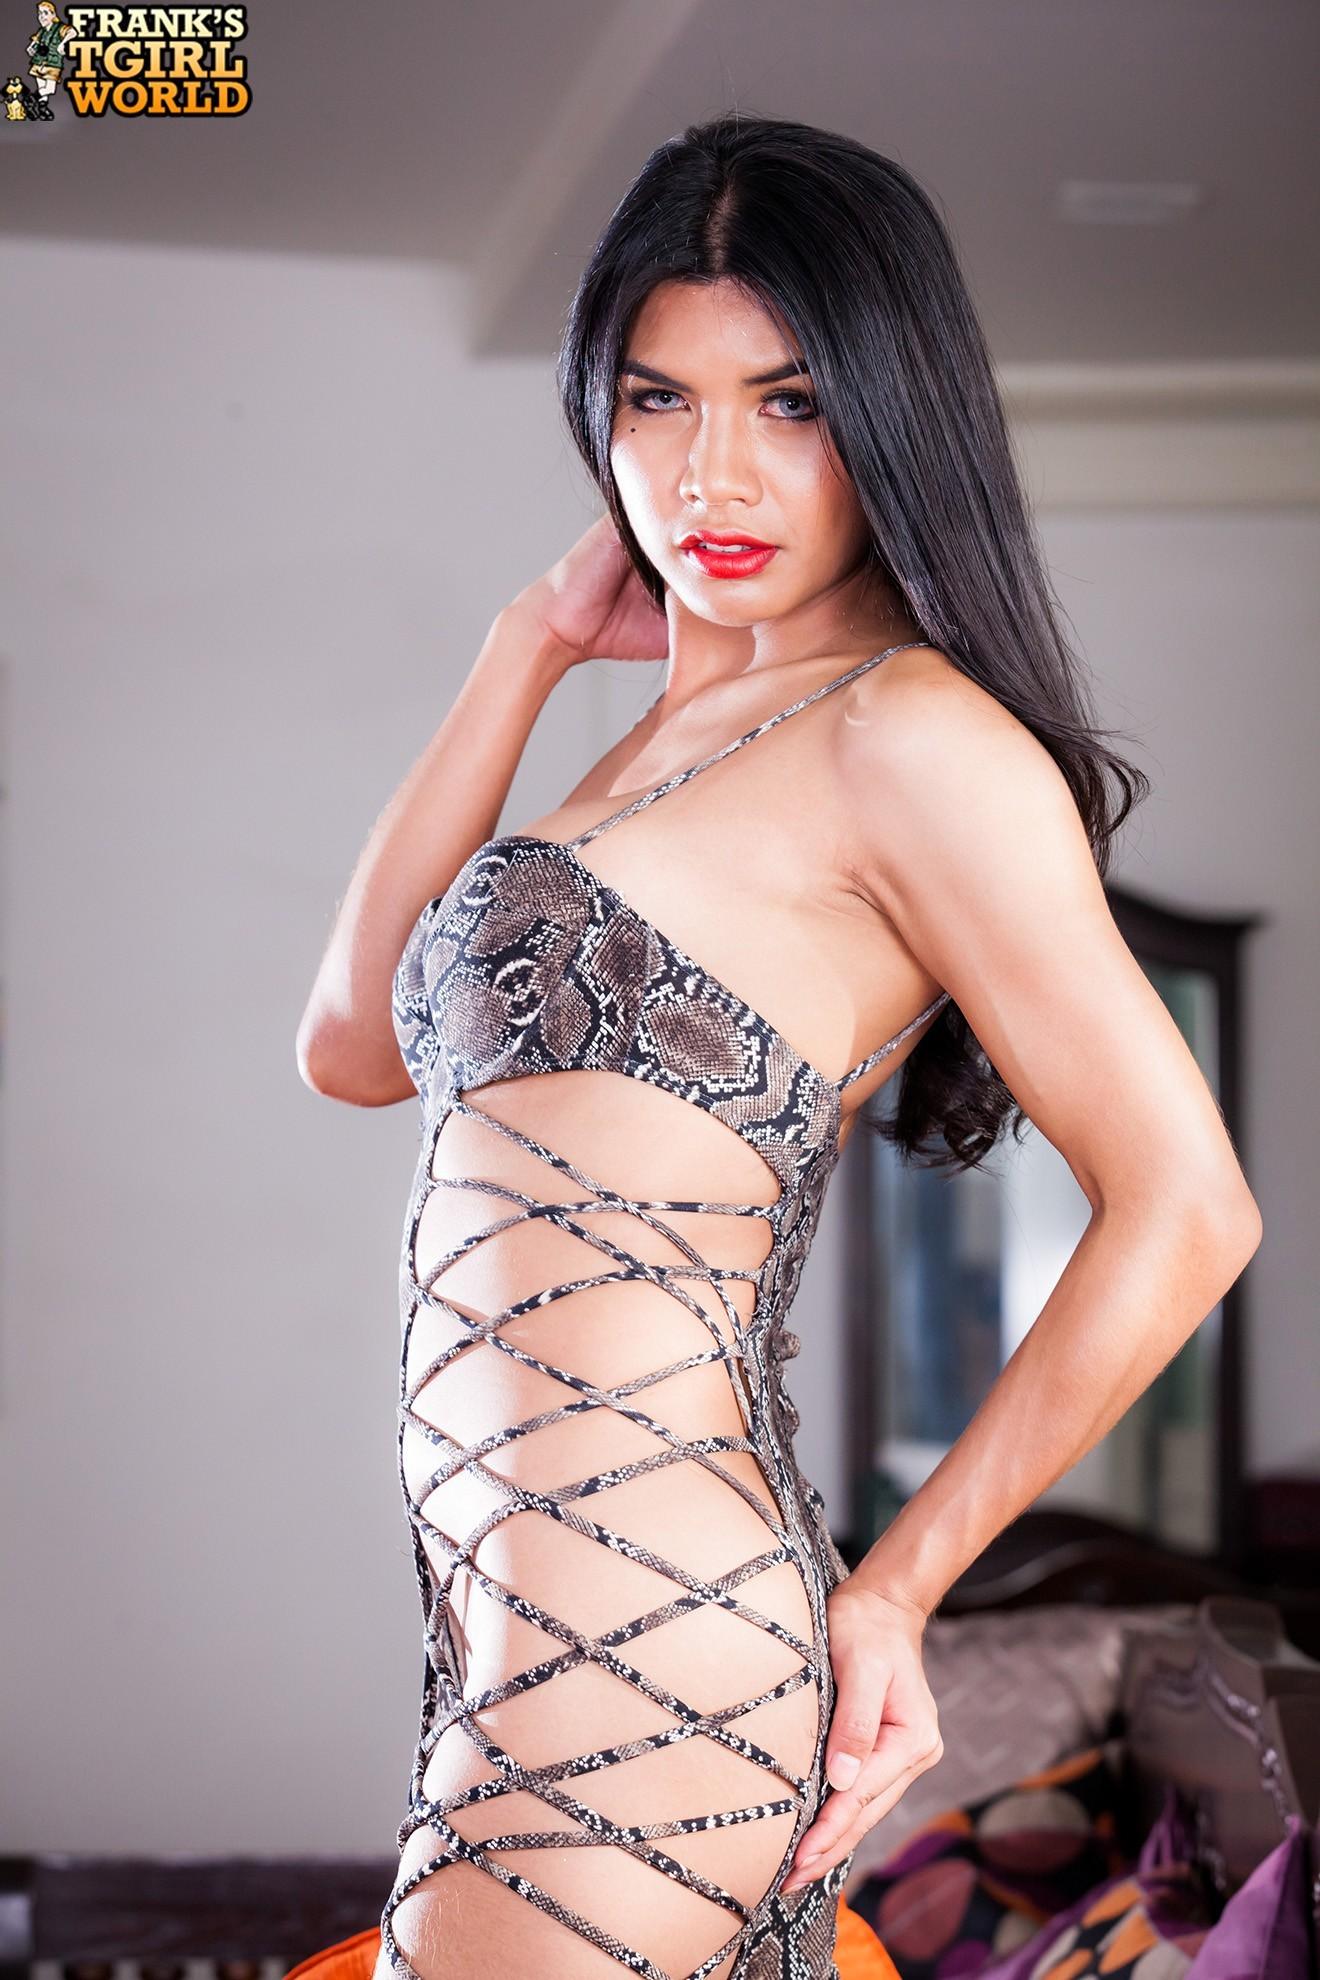 Lidia Flirtatious In Animal Printed Body Stockings